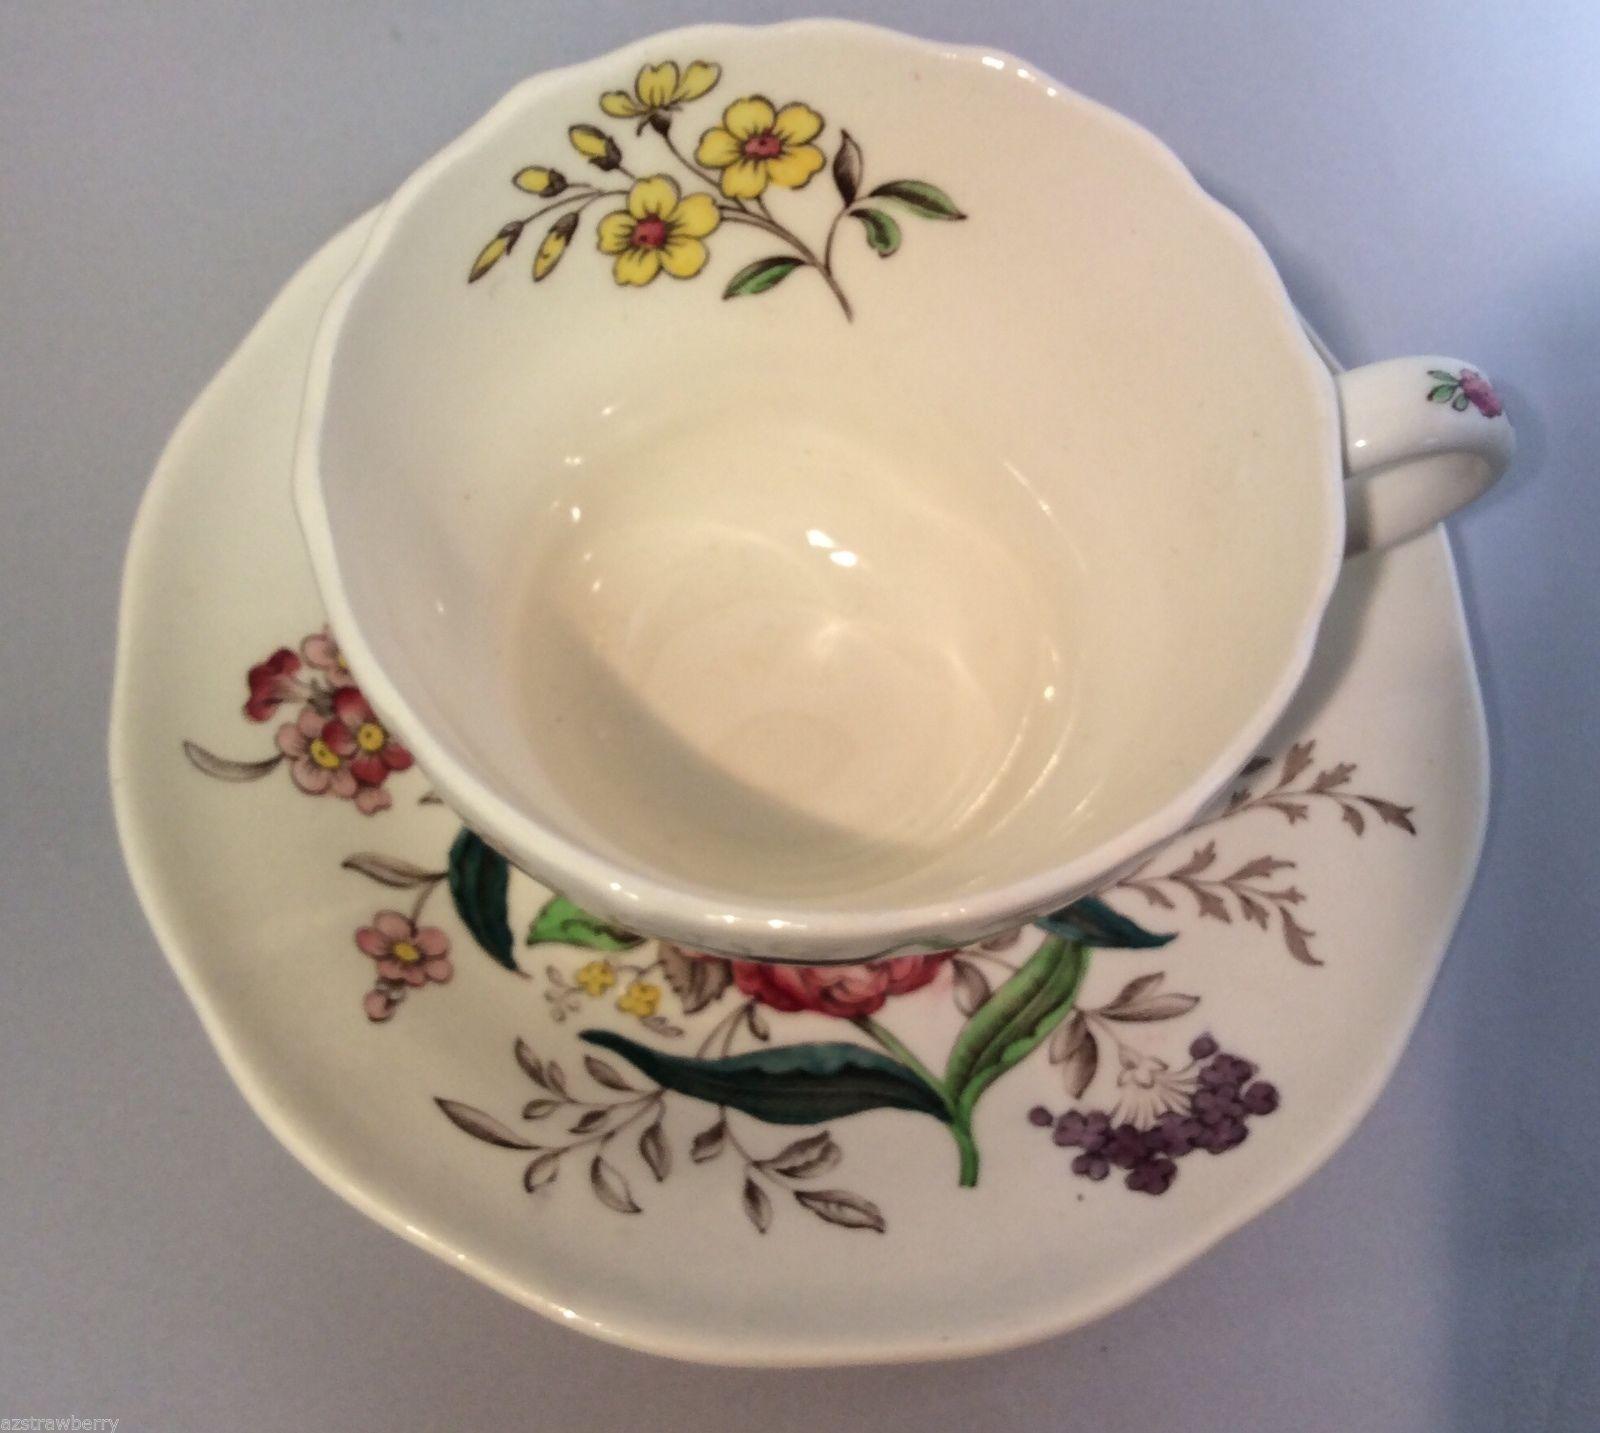 Copeland Spode Great Britain Gainsborough Porcelain Tea Coffee sup & saucer set